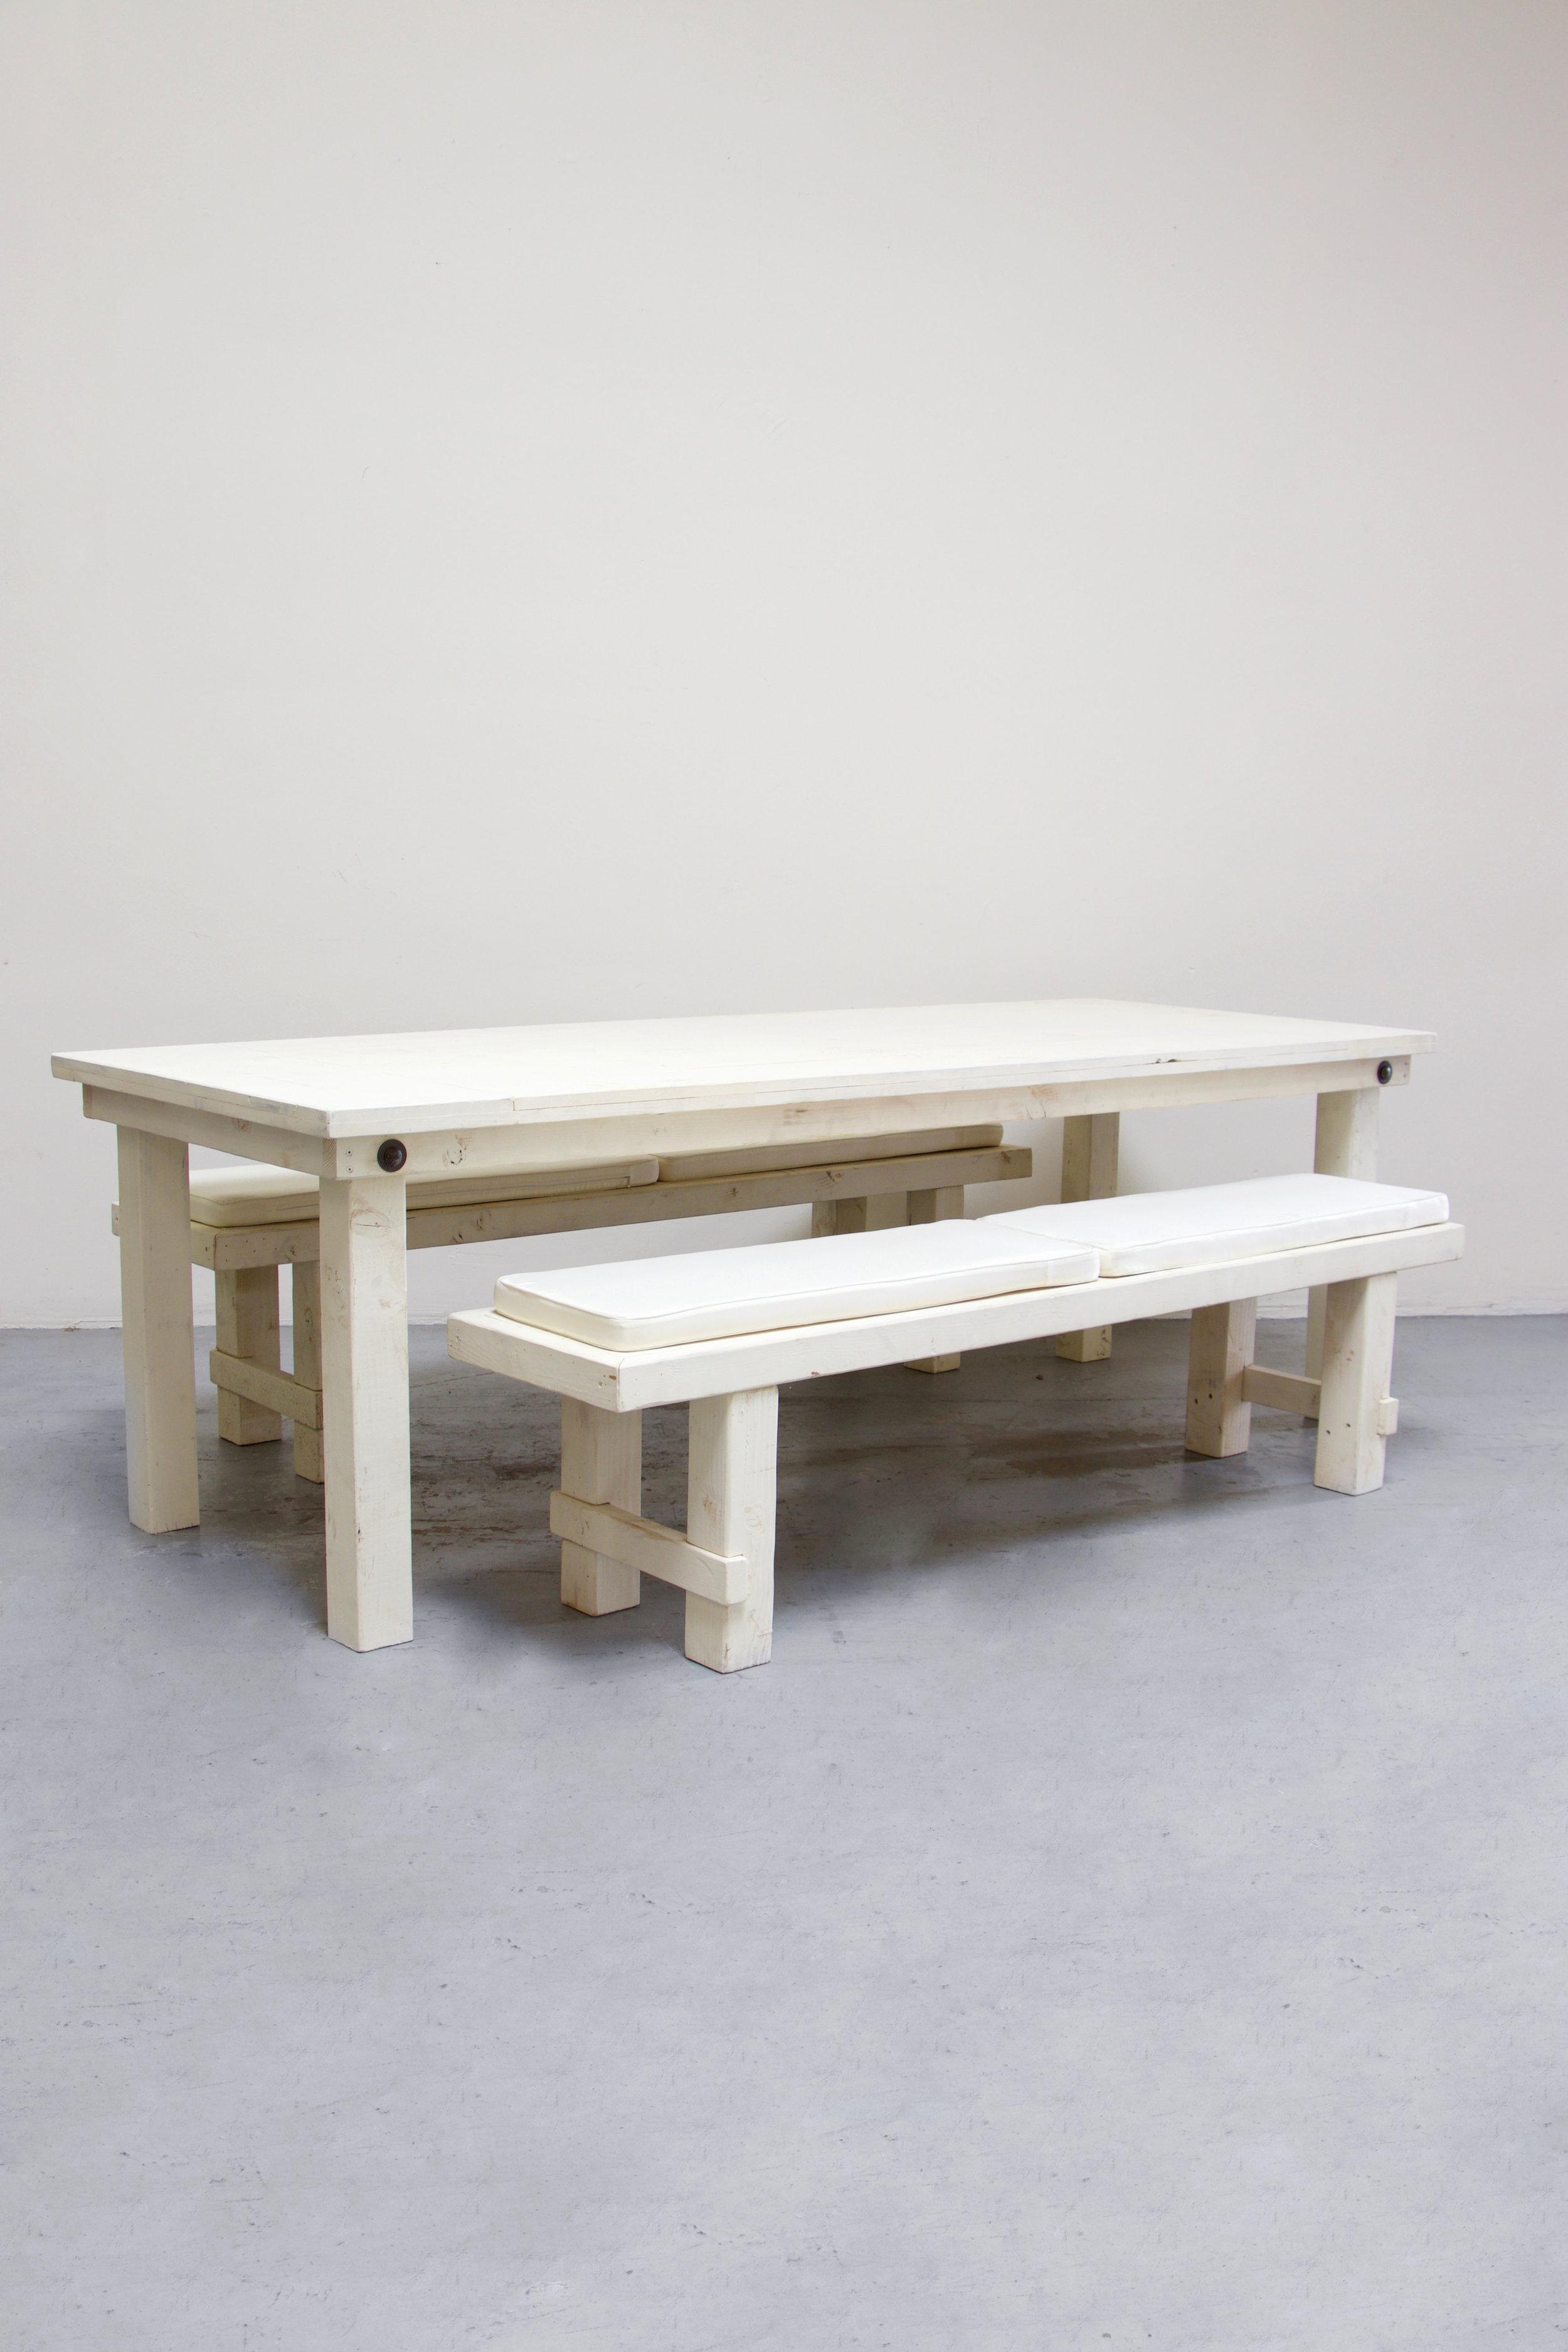 $145 1 Vintage White Farm Table w/ 2 Long Benches